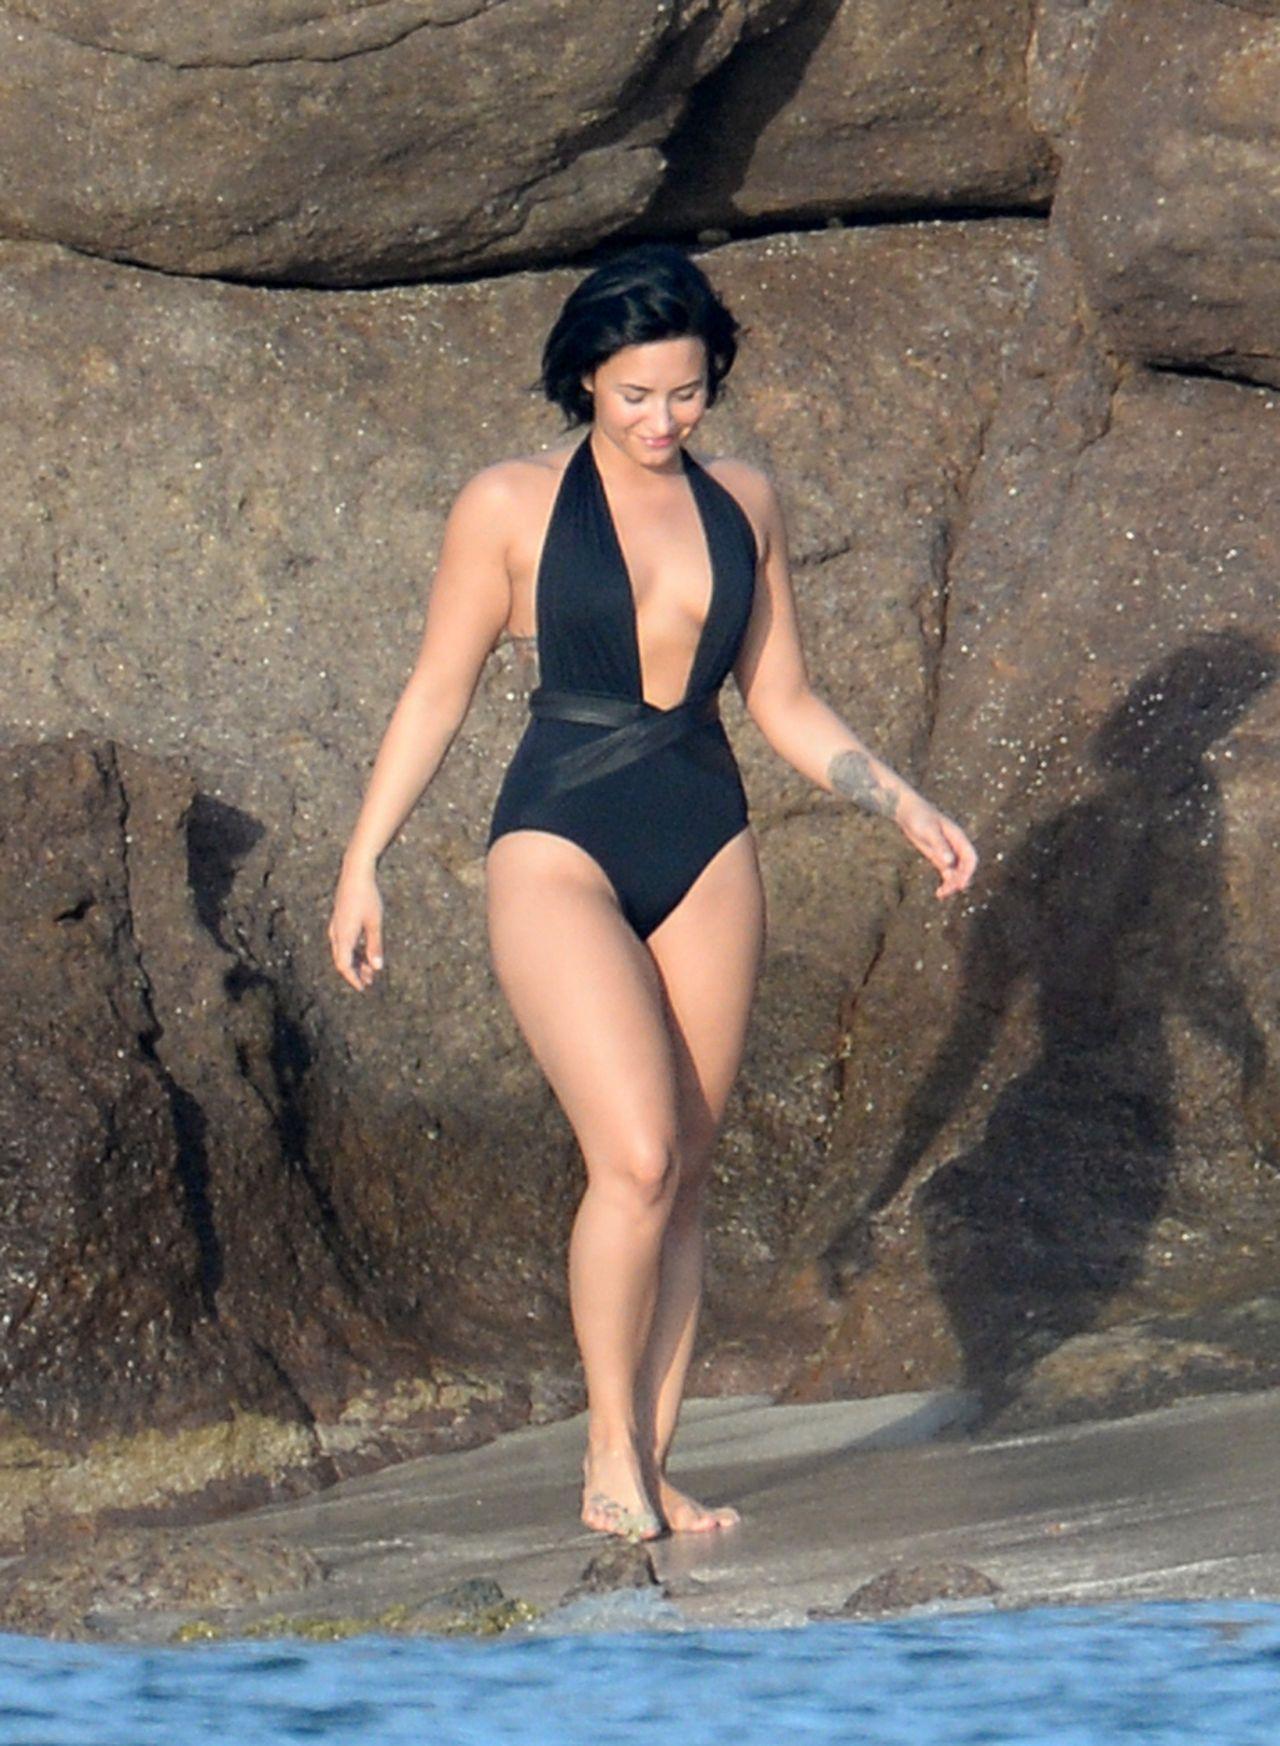 Nicole jones bikini